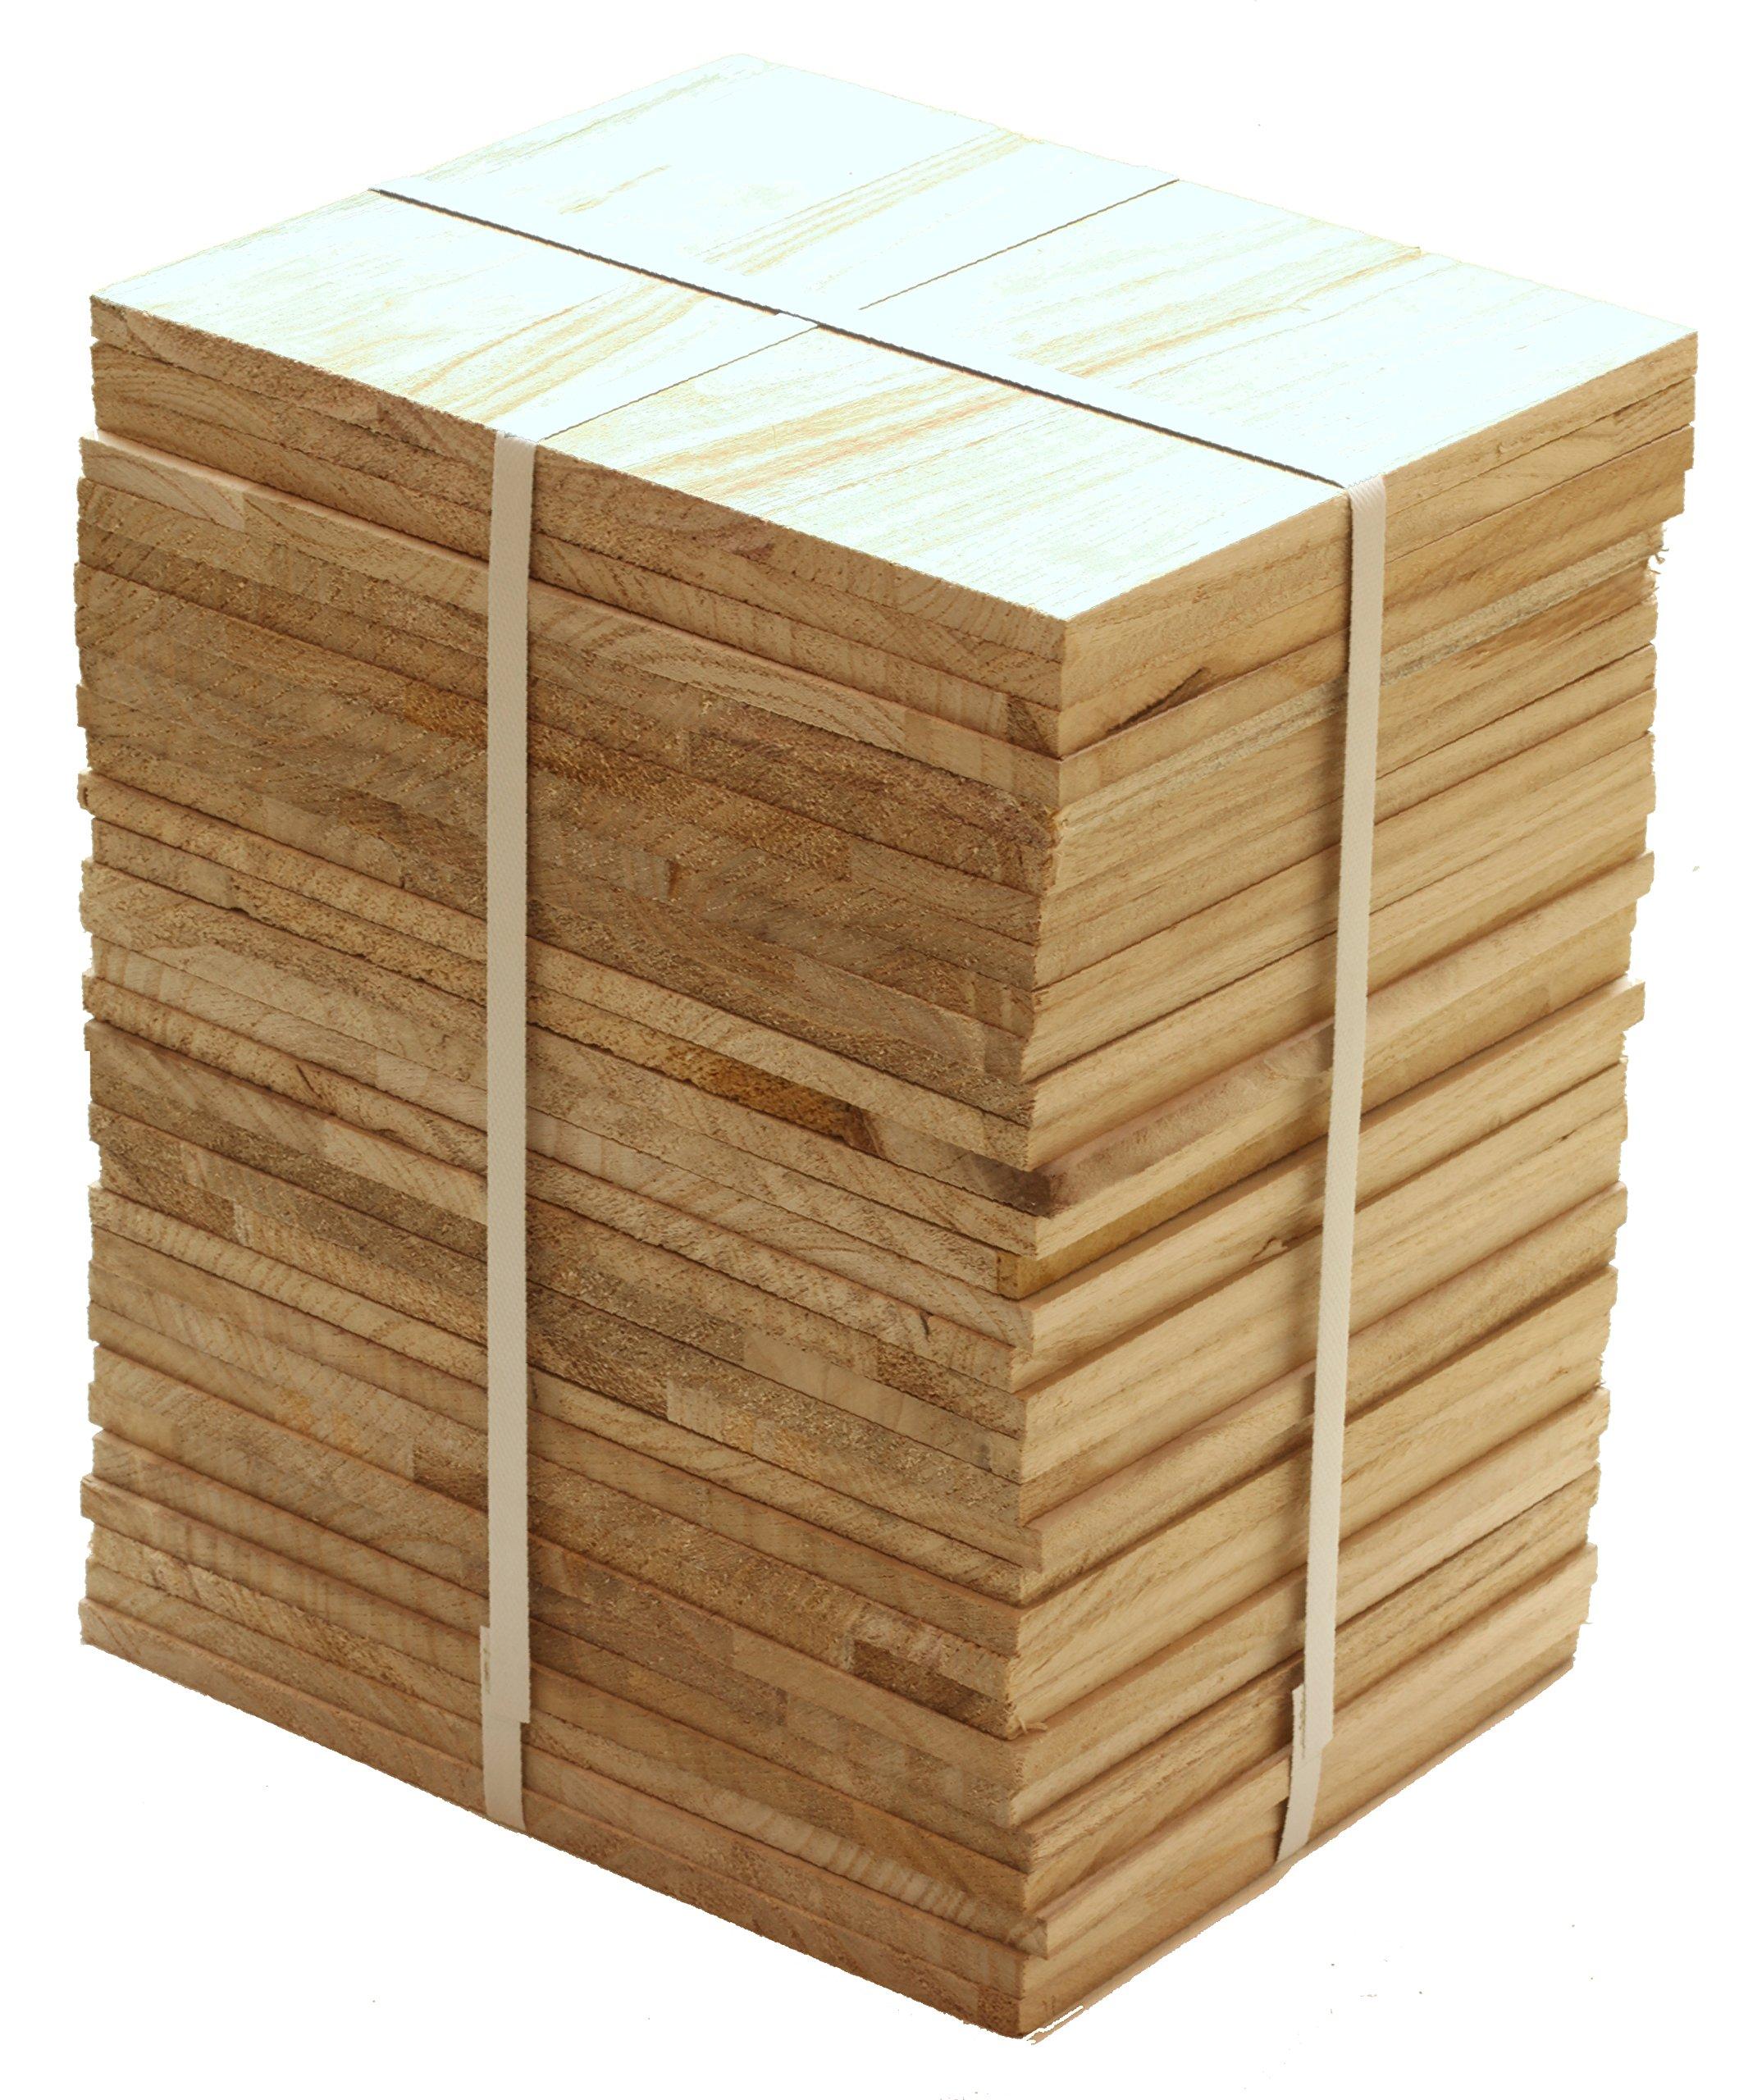 Tiger Claw Wood Breaking Board - Breakable Board in 12 mm Thickness (1/2 Case - 32 Board Pack)